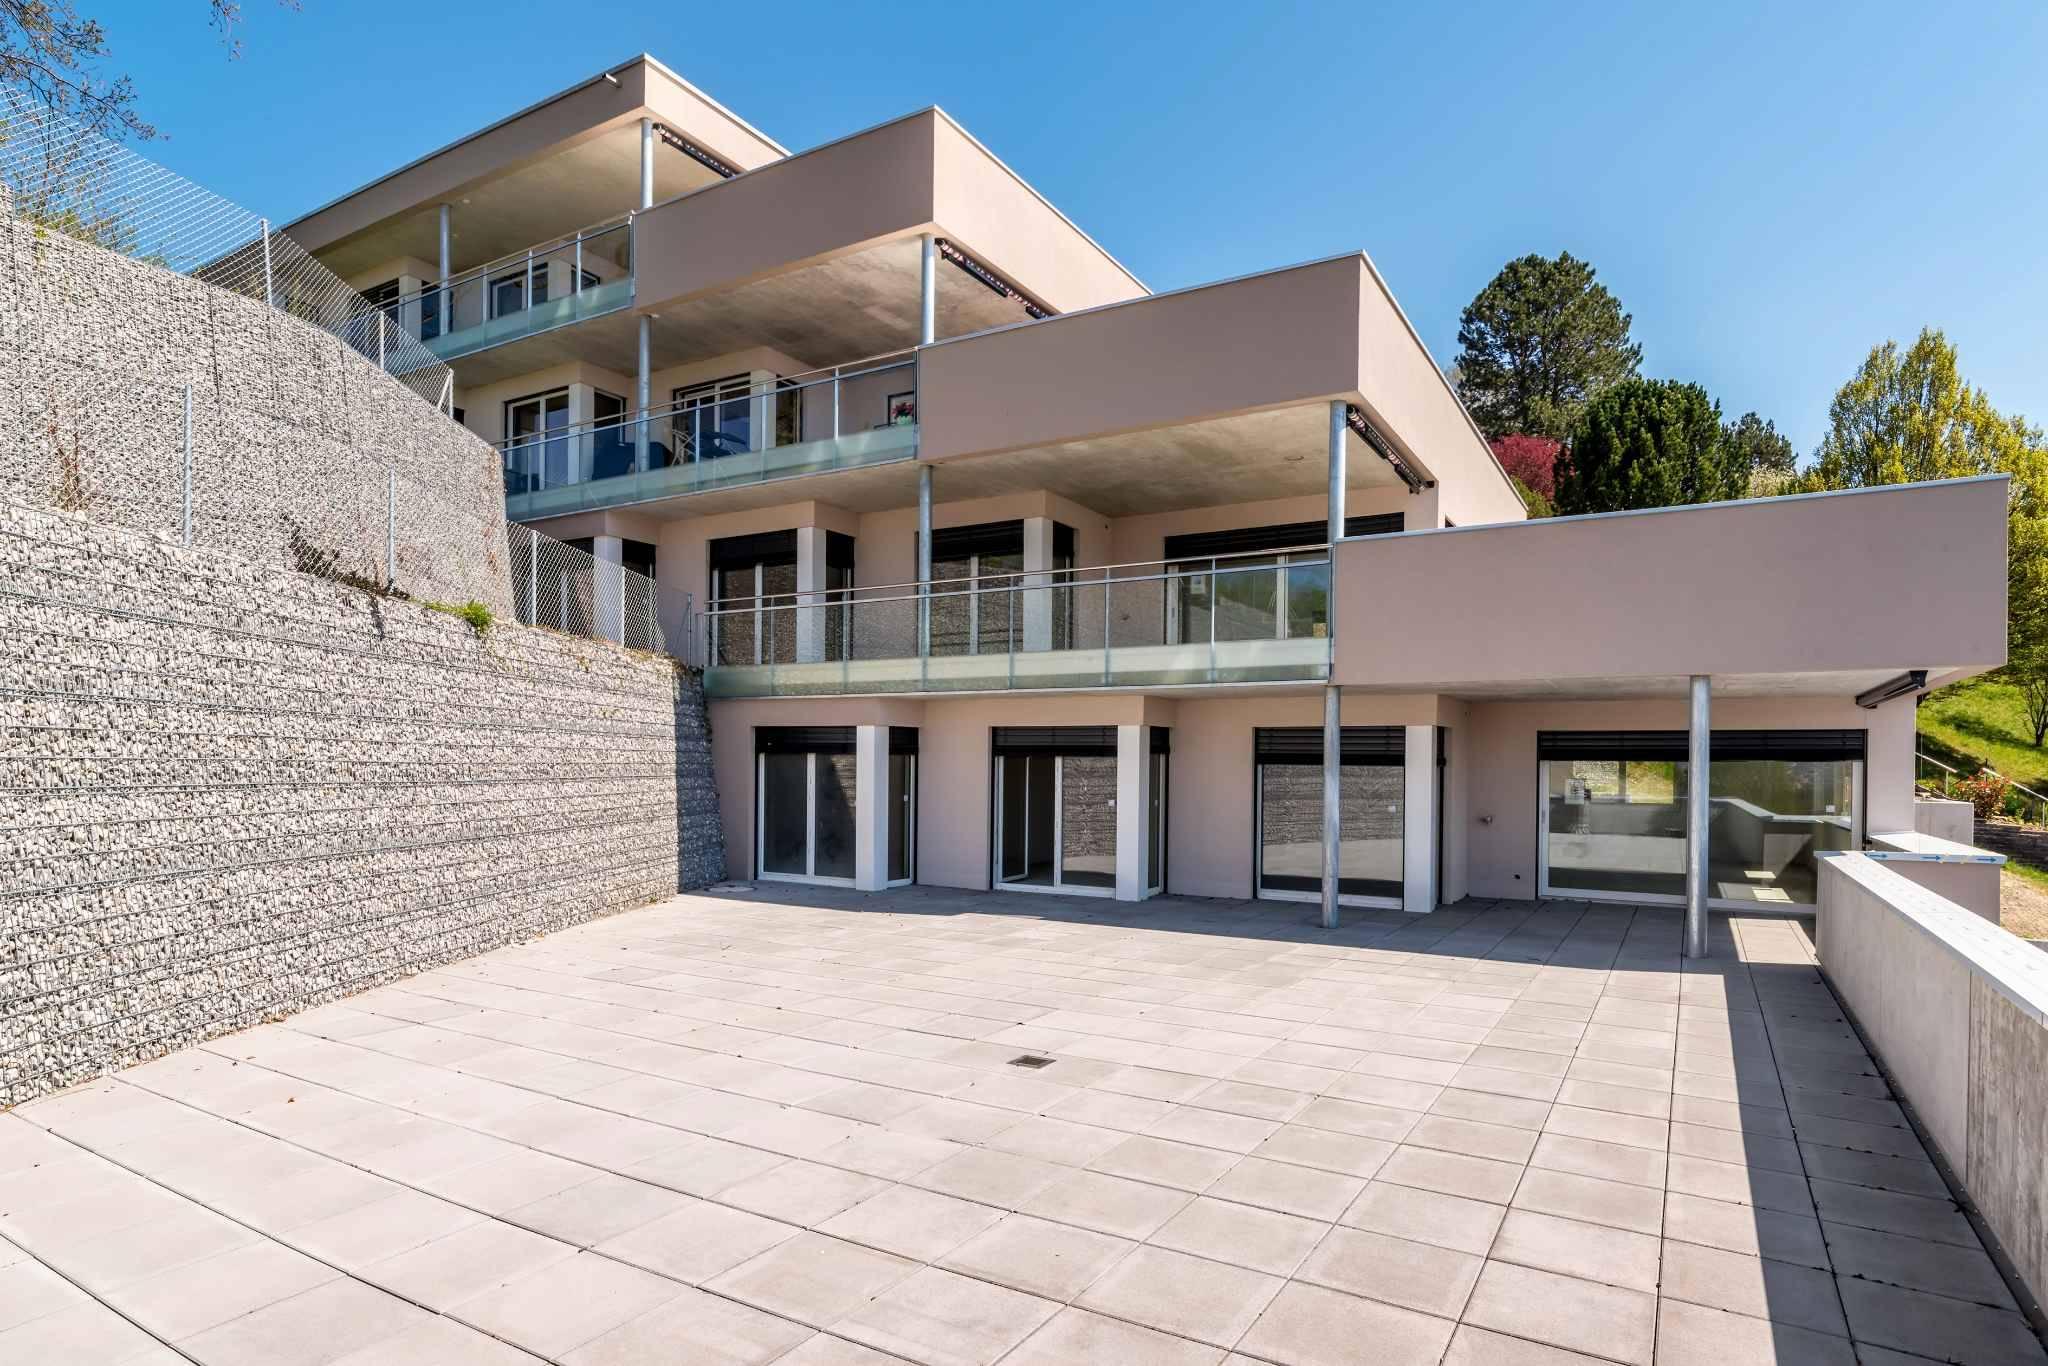 Bel appartement en terrasse de 4.5 pièces